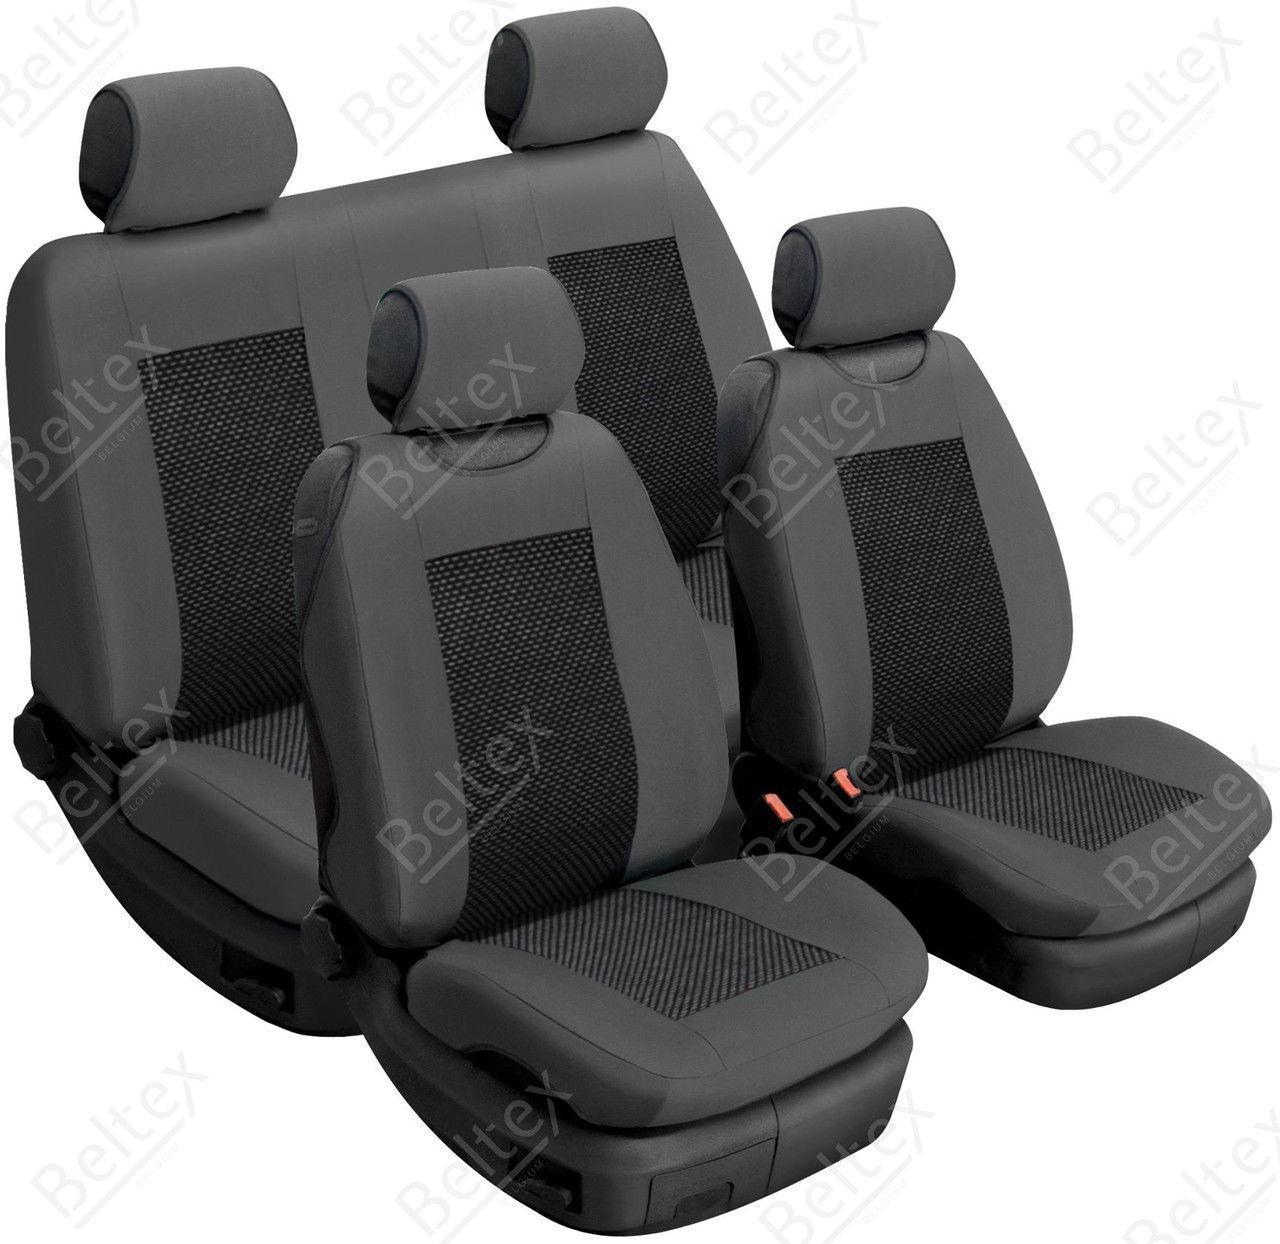 Майки/чехлы на сиденья Ситроен С4 (Citroen С4)